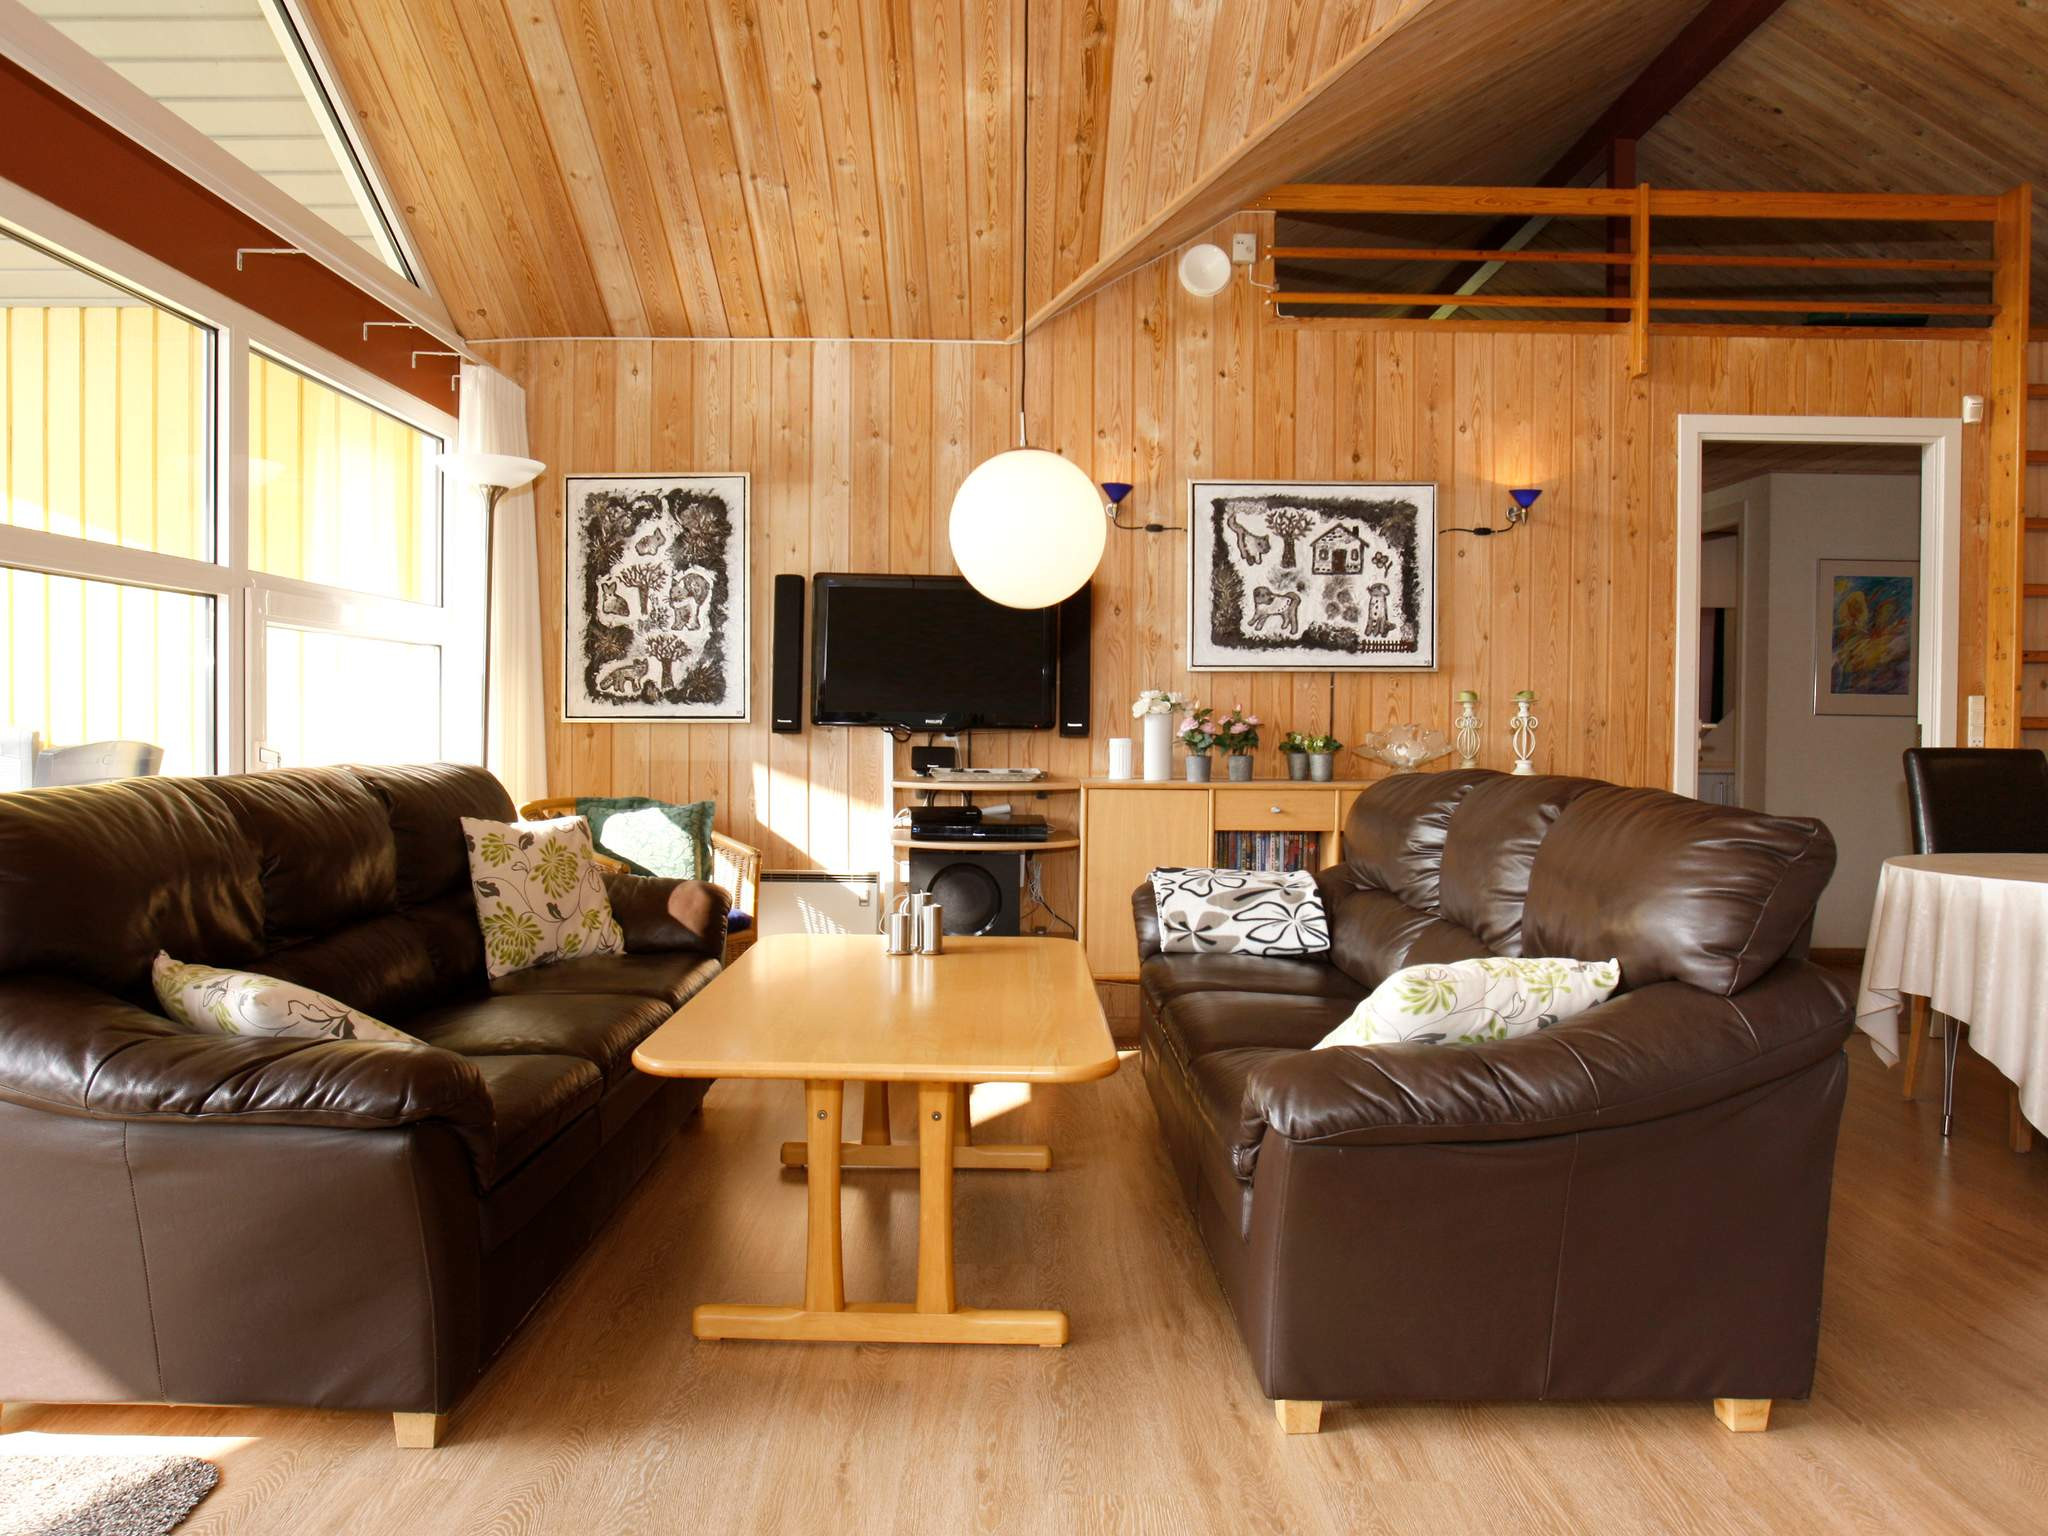 Ferienhaus Øster Hurup (89296), Øster Hurup, , Ostjütland, Dänemark, Bild 4